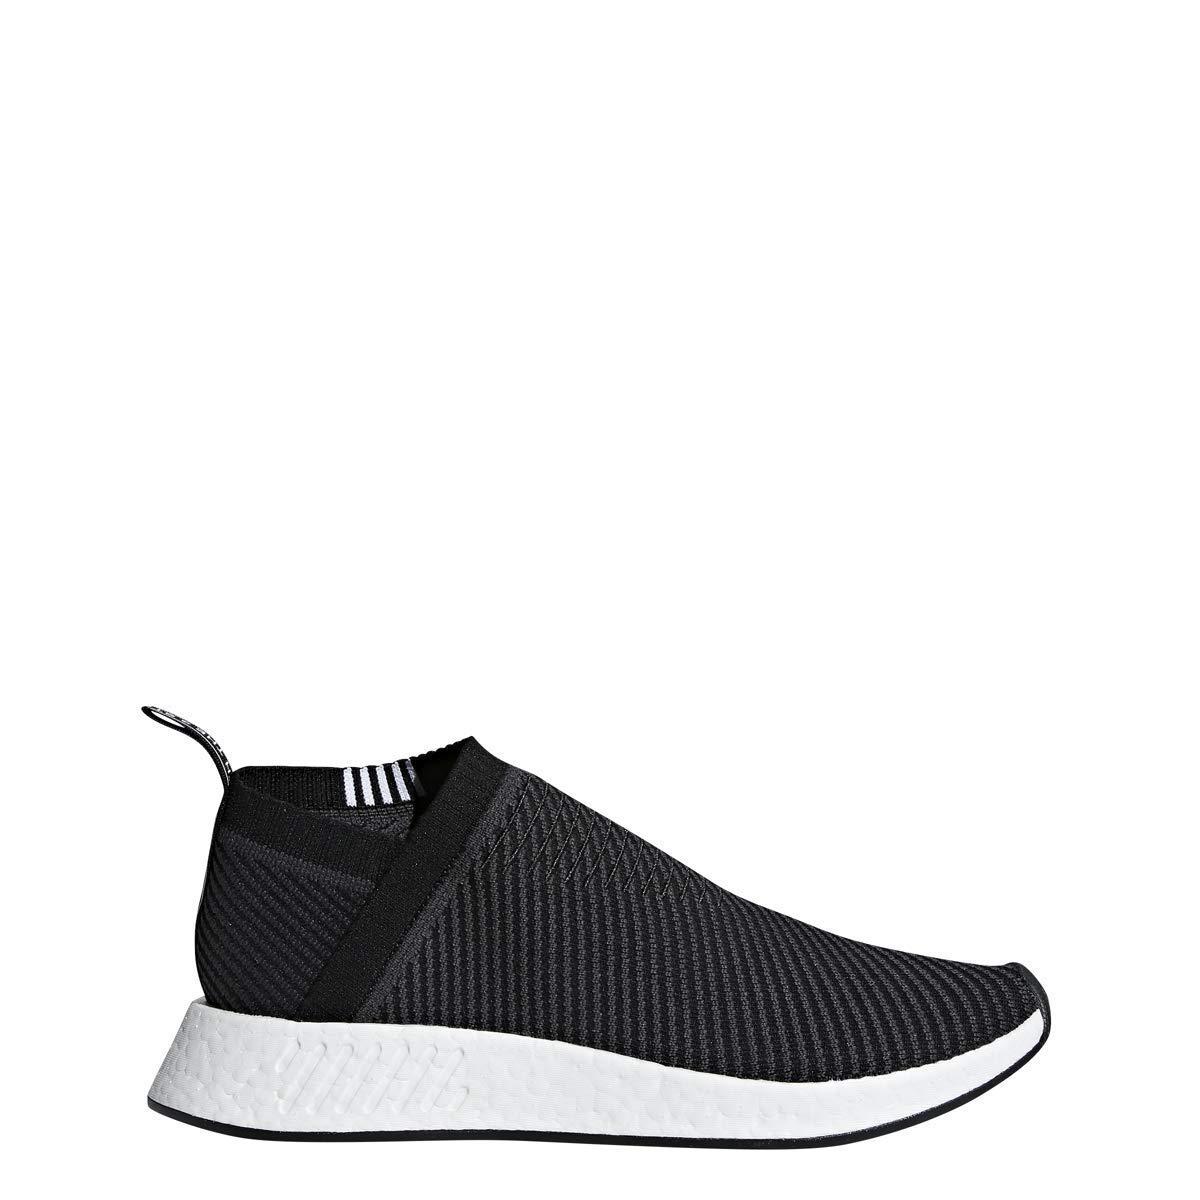 adidas Originals NMD_CS2 Primeknit Shoe Men's Casual